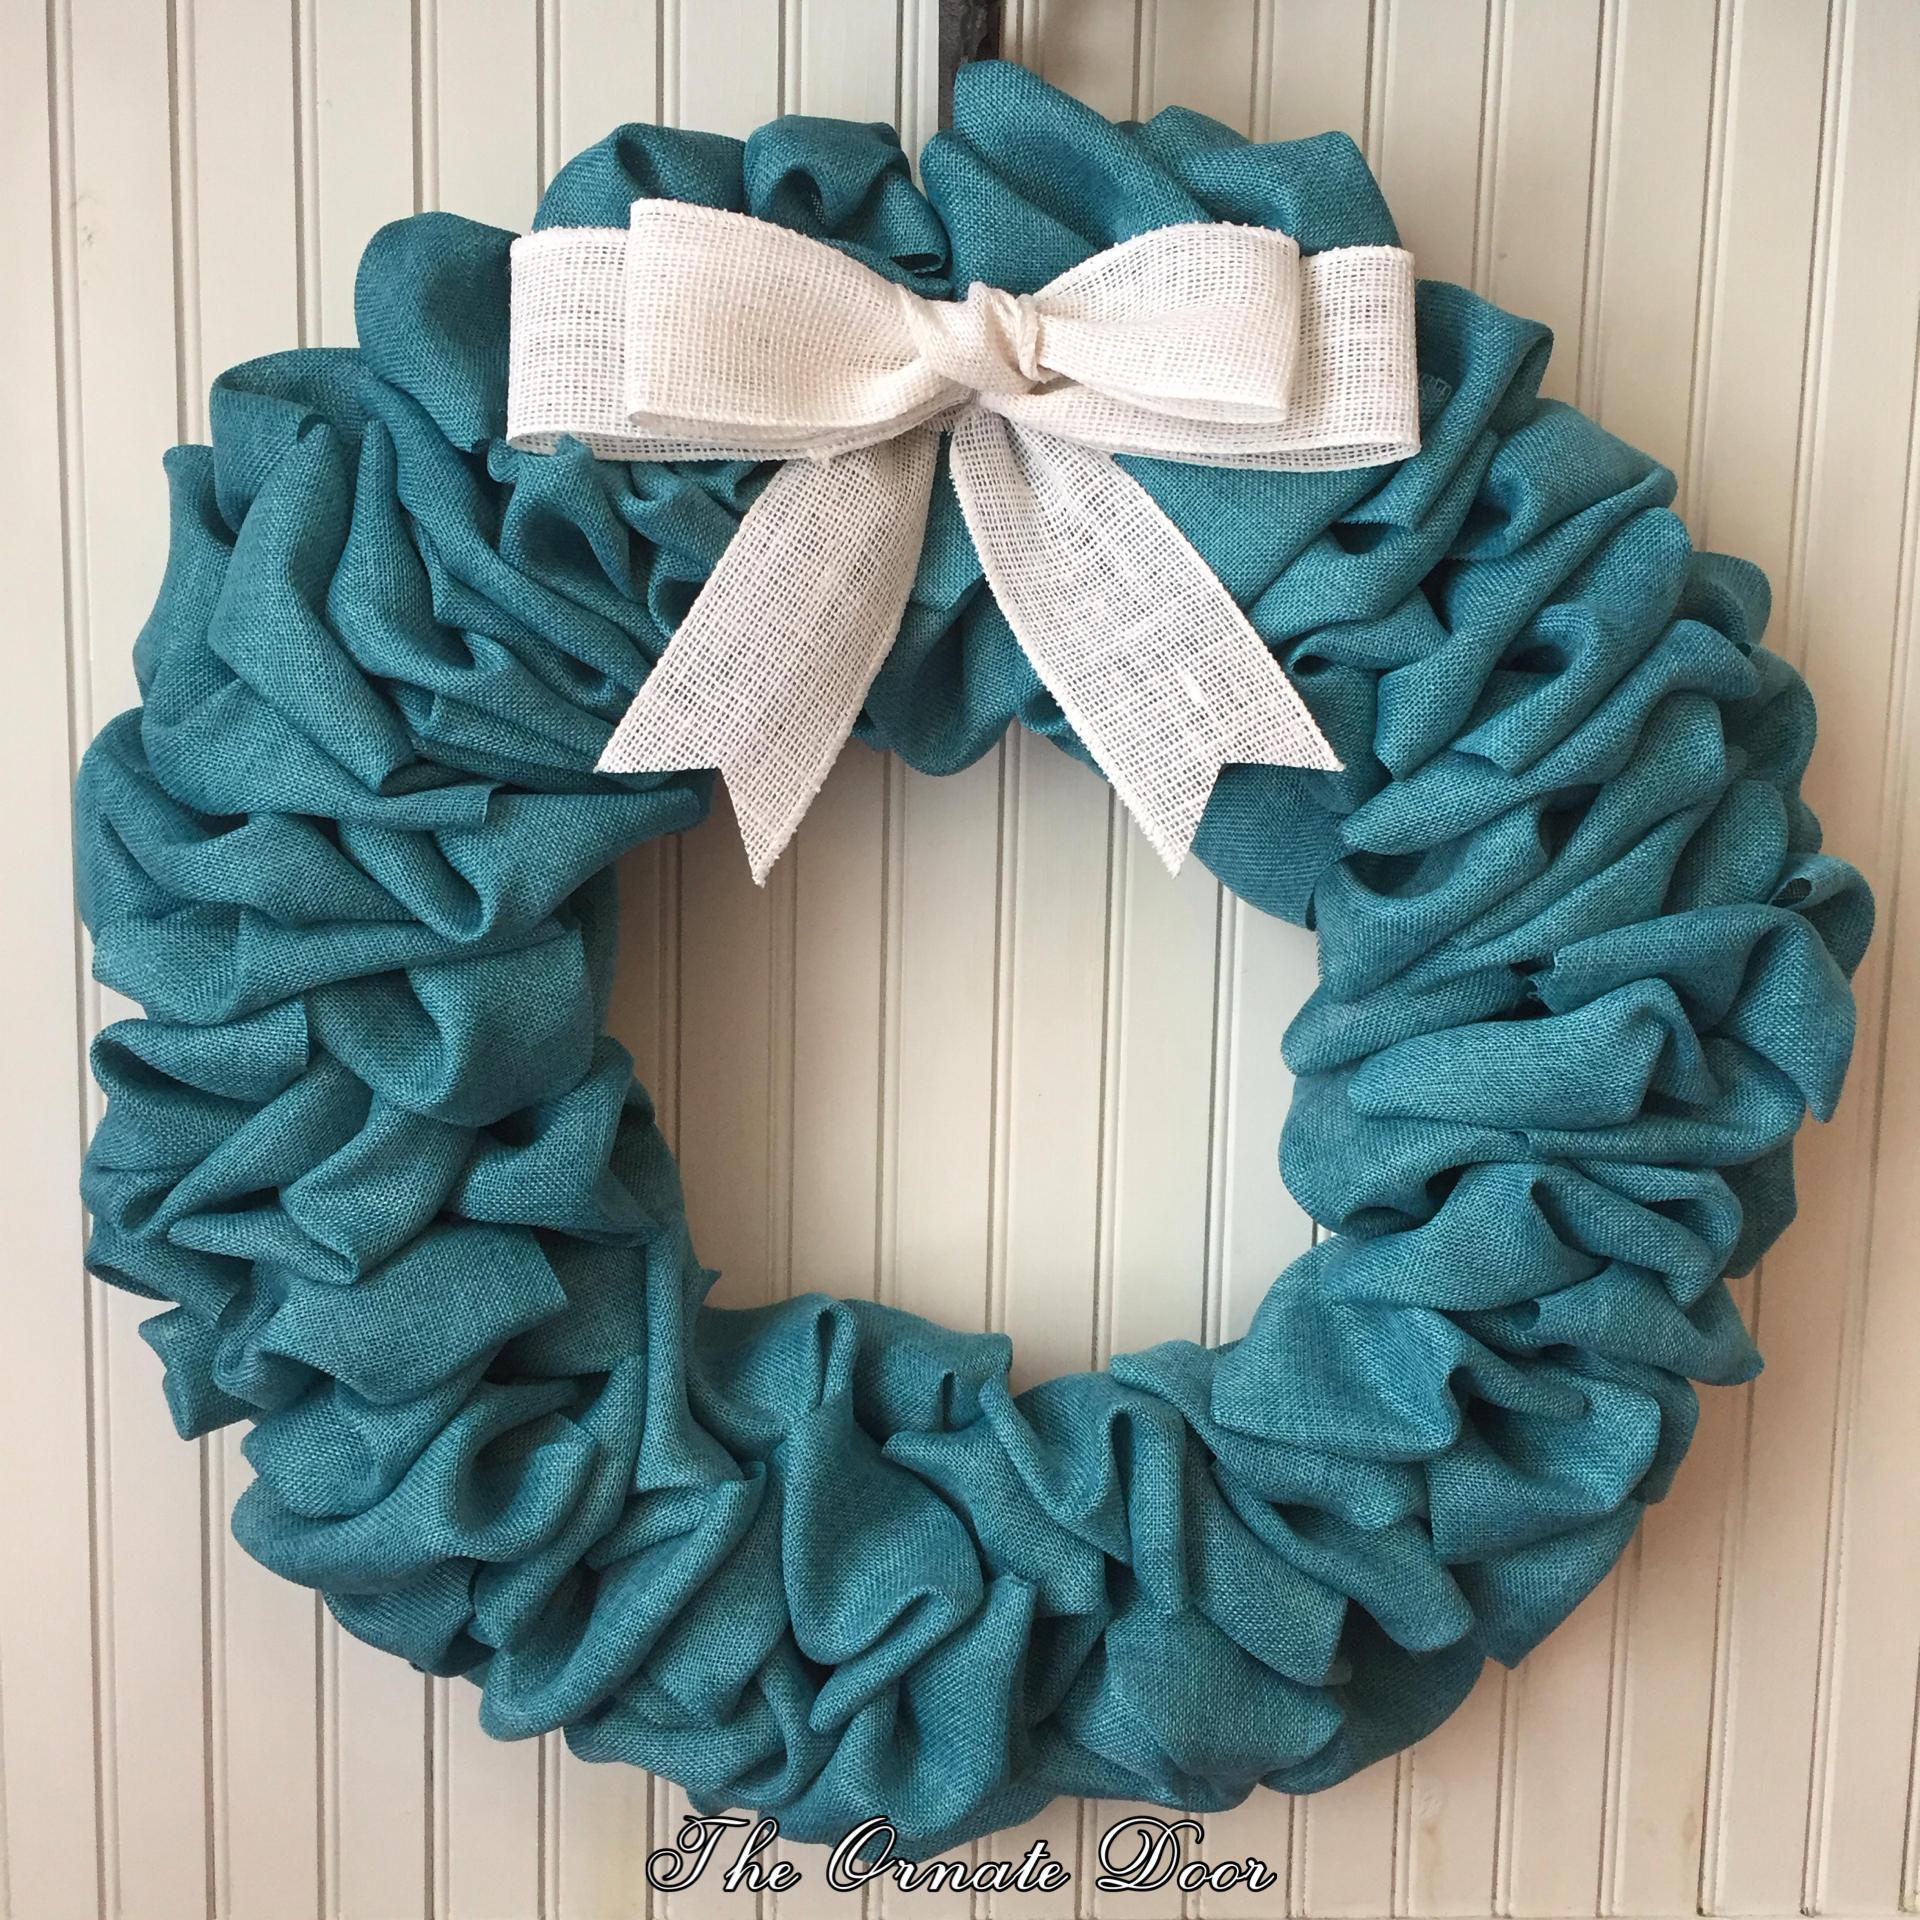 Turquoise wreath turquoise burlap wreath teal wreath